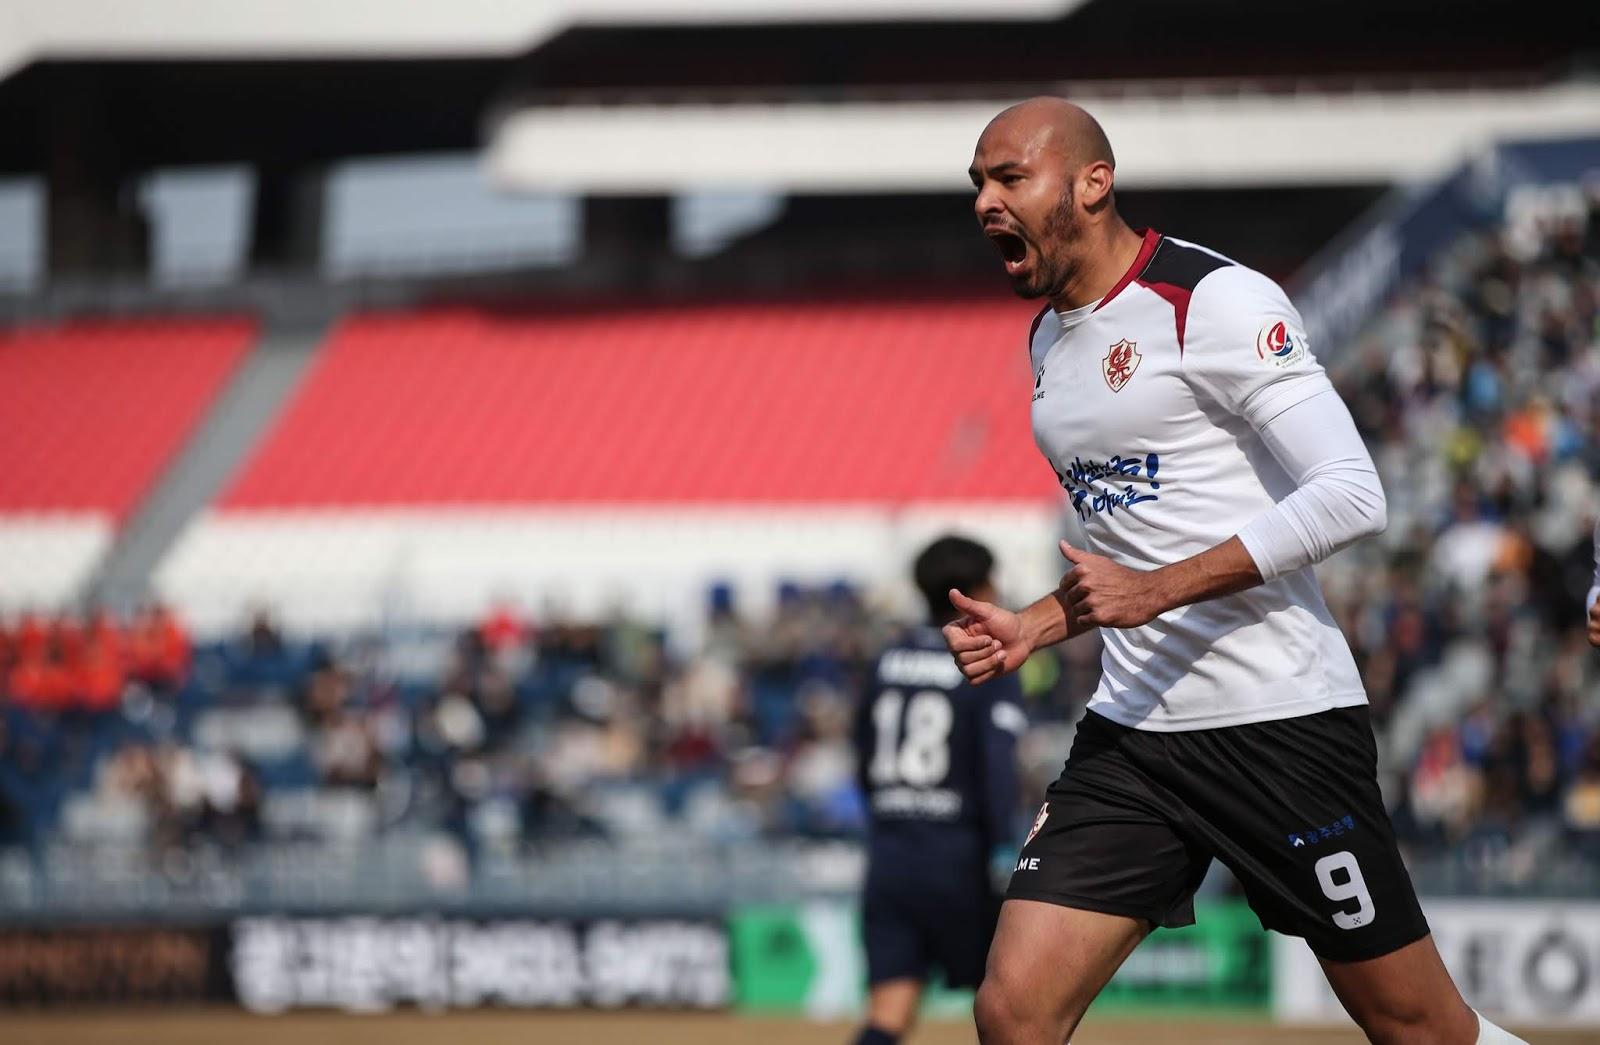 K League 2 Preview: Seoul E-Land vs Gwangju FC